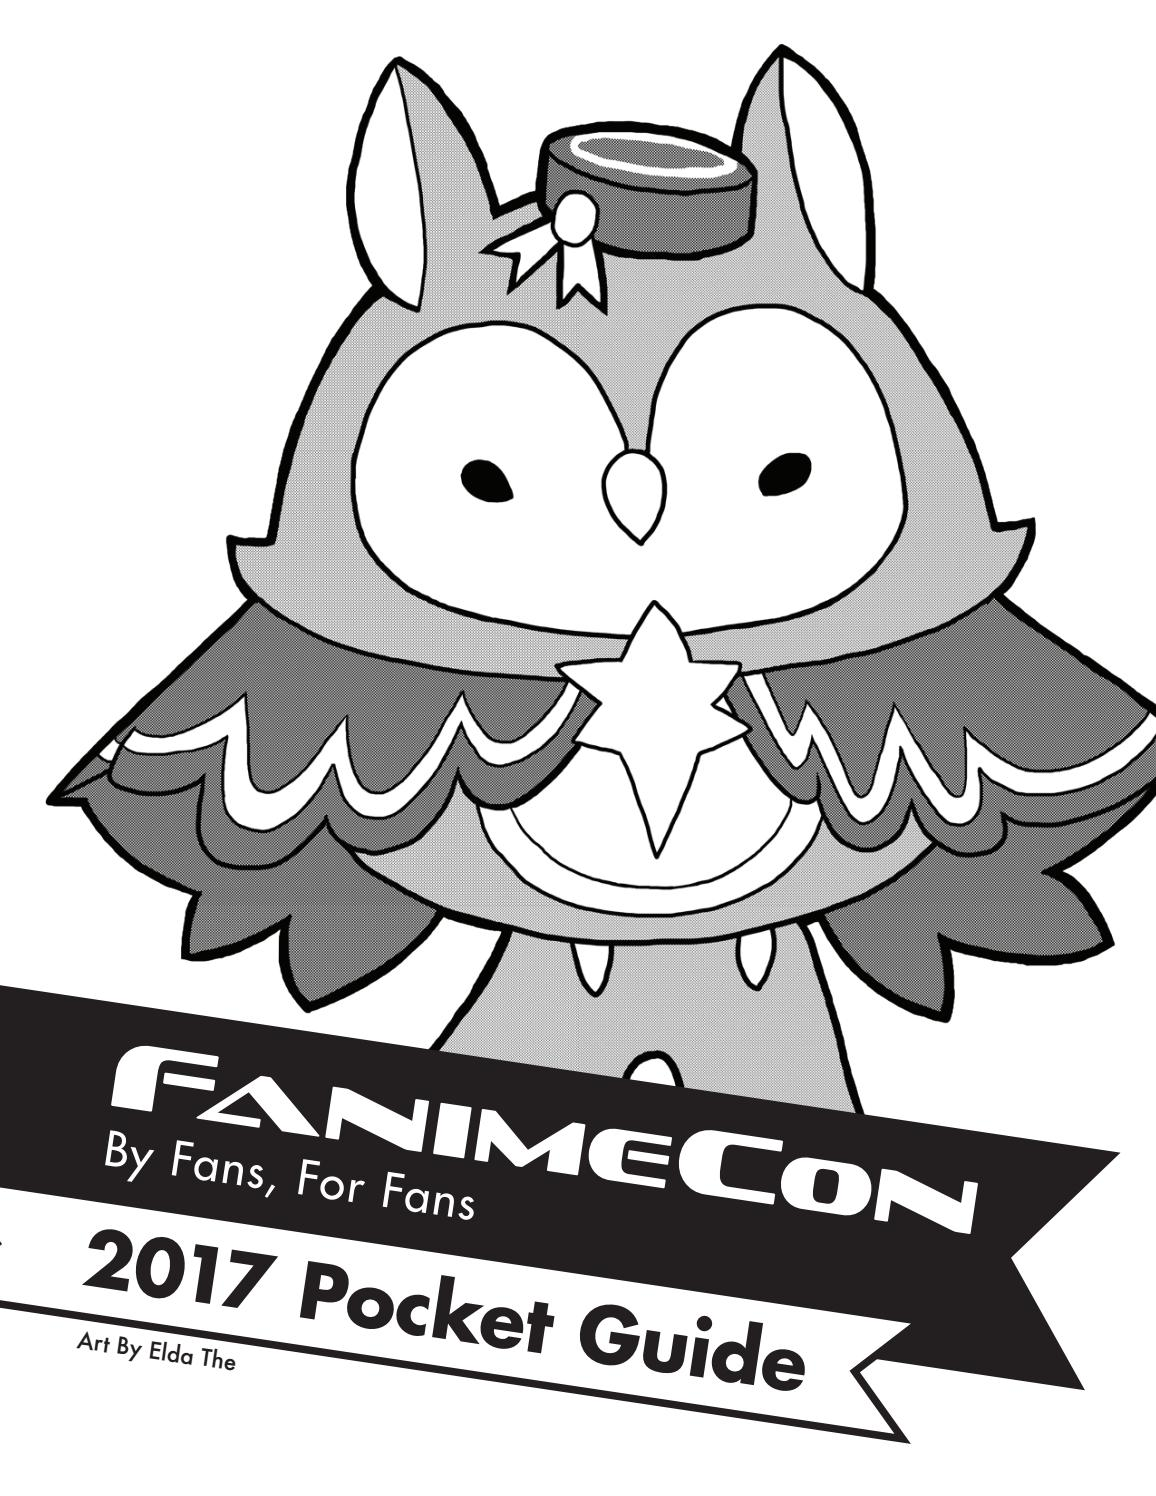 fanimecon 2017 pocket guide by fanimecon issuu Demon King Movie 2017 Dallas